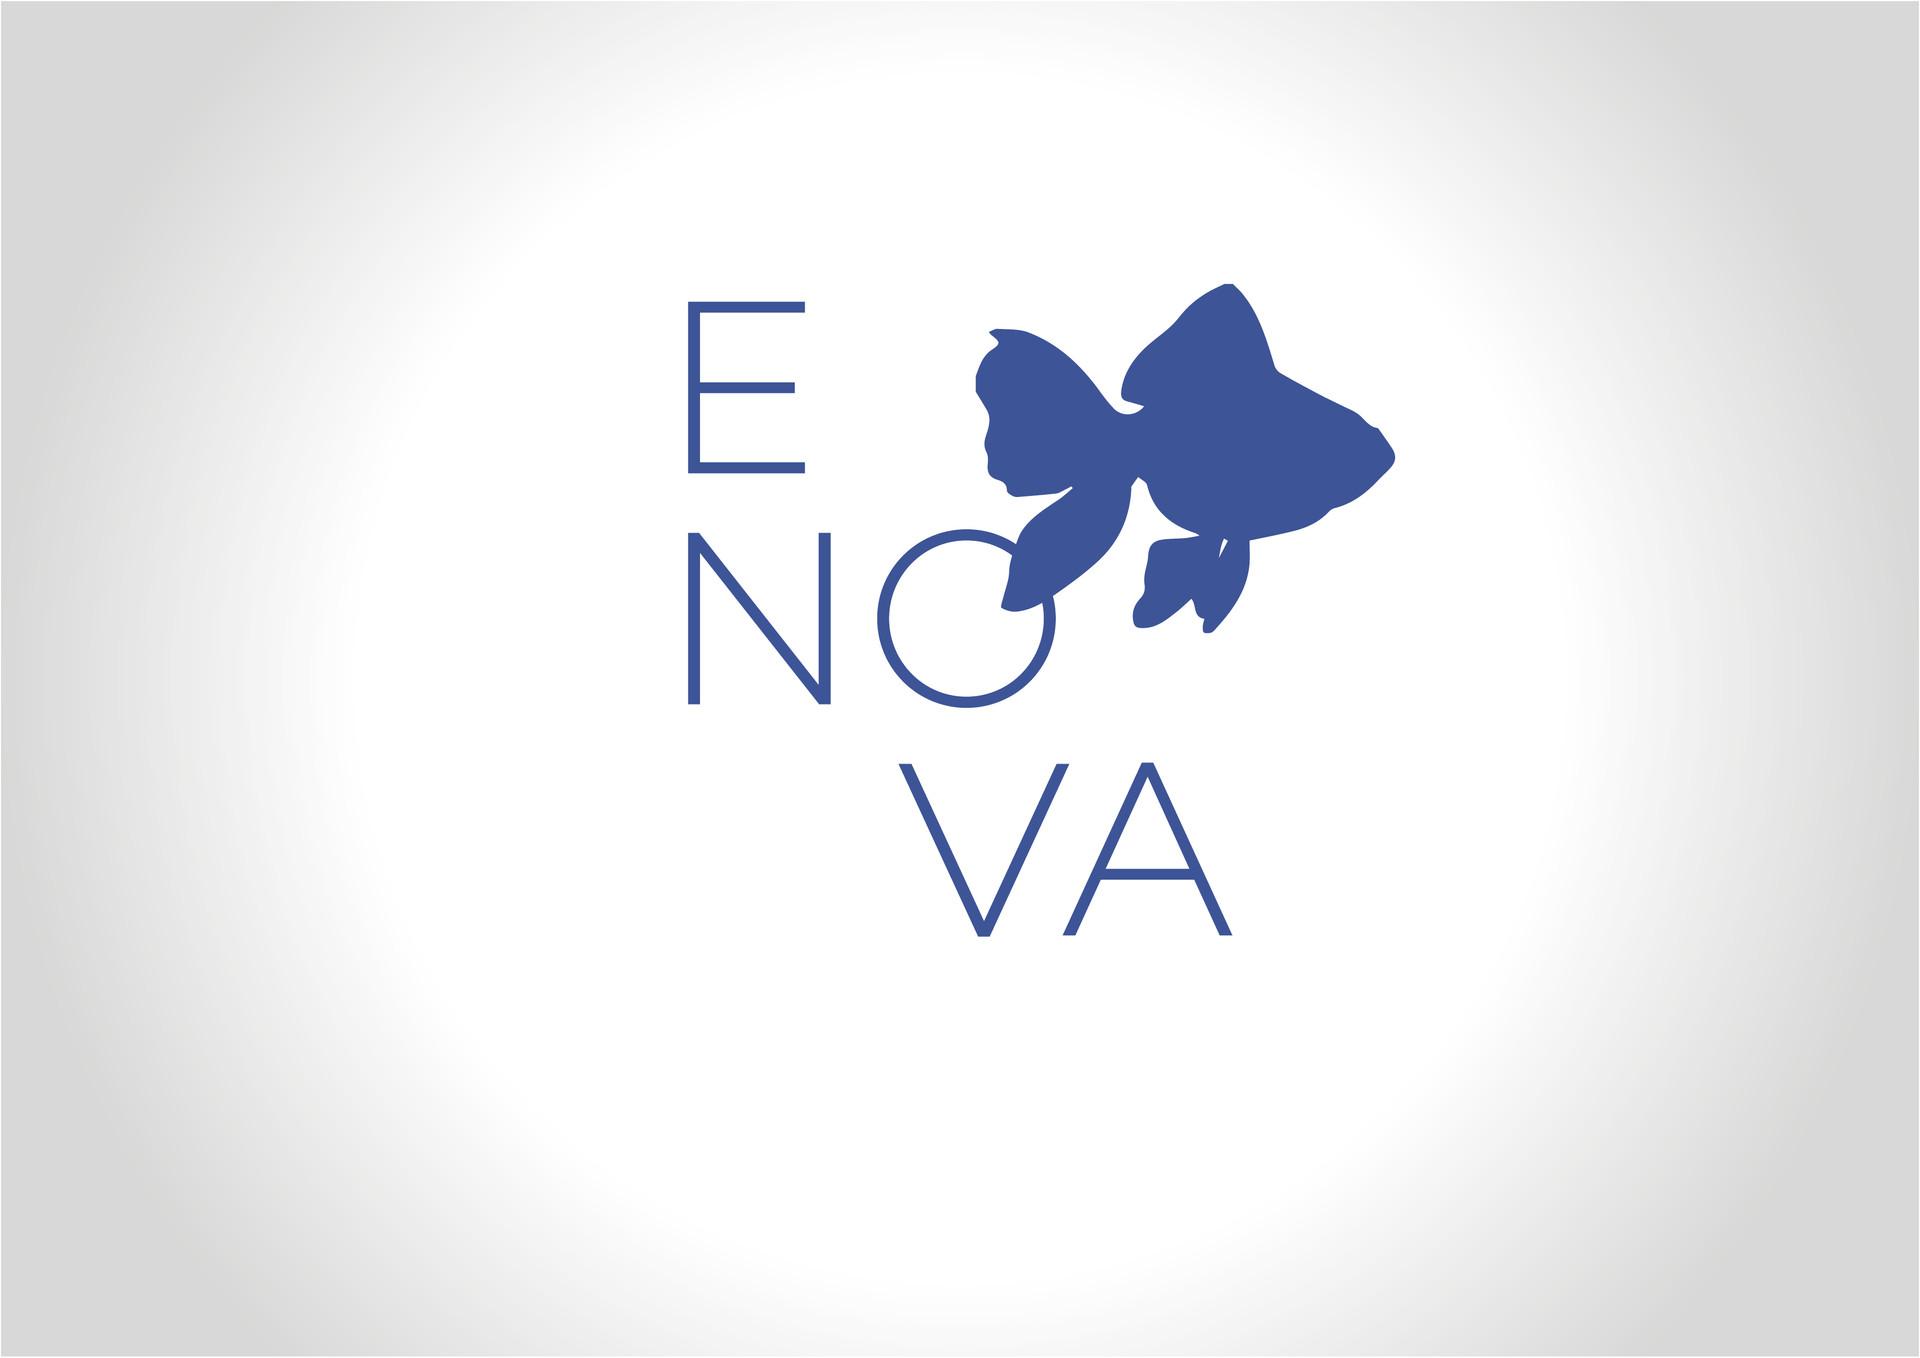 Enova_Escola_Nova_logo_3.jpg